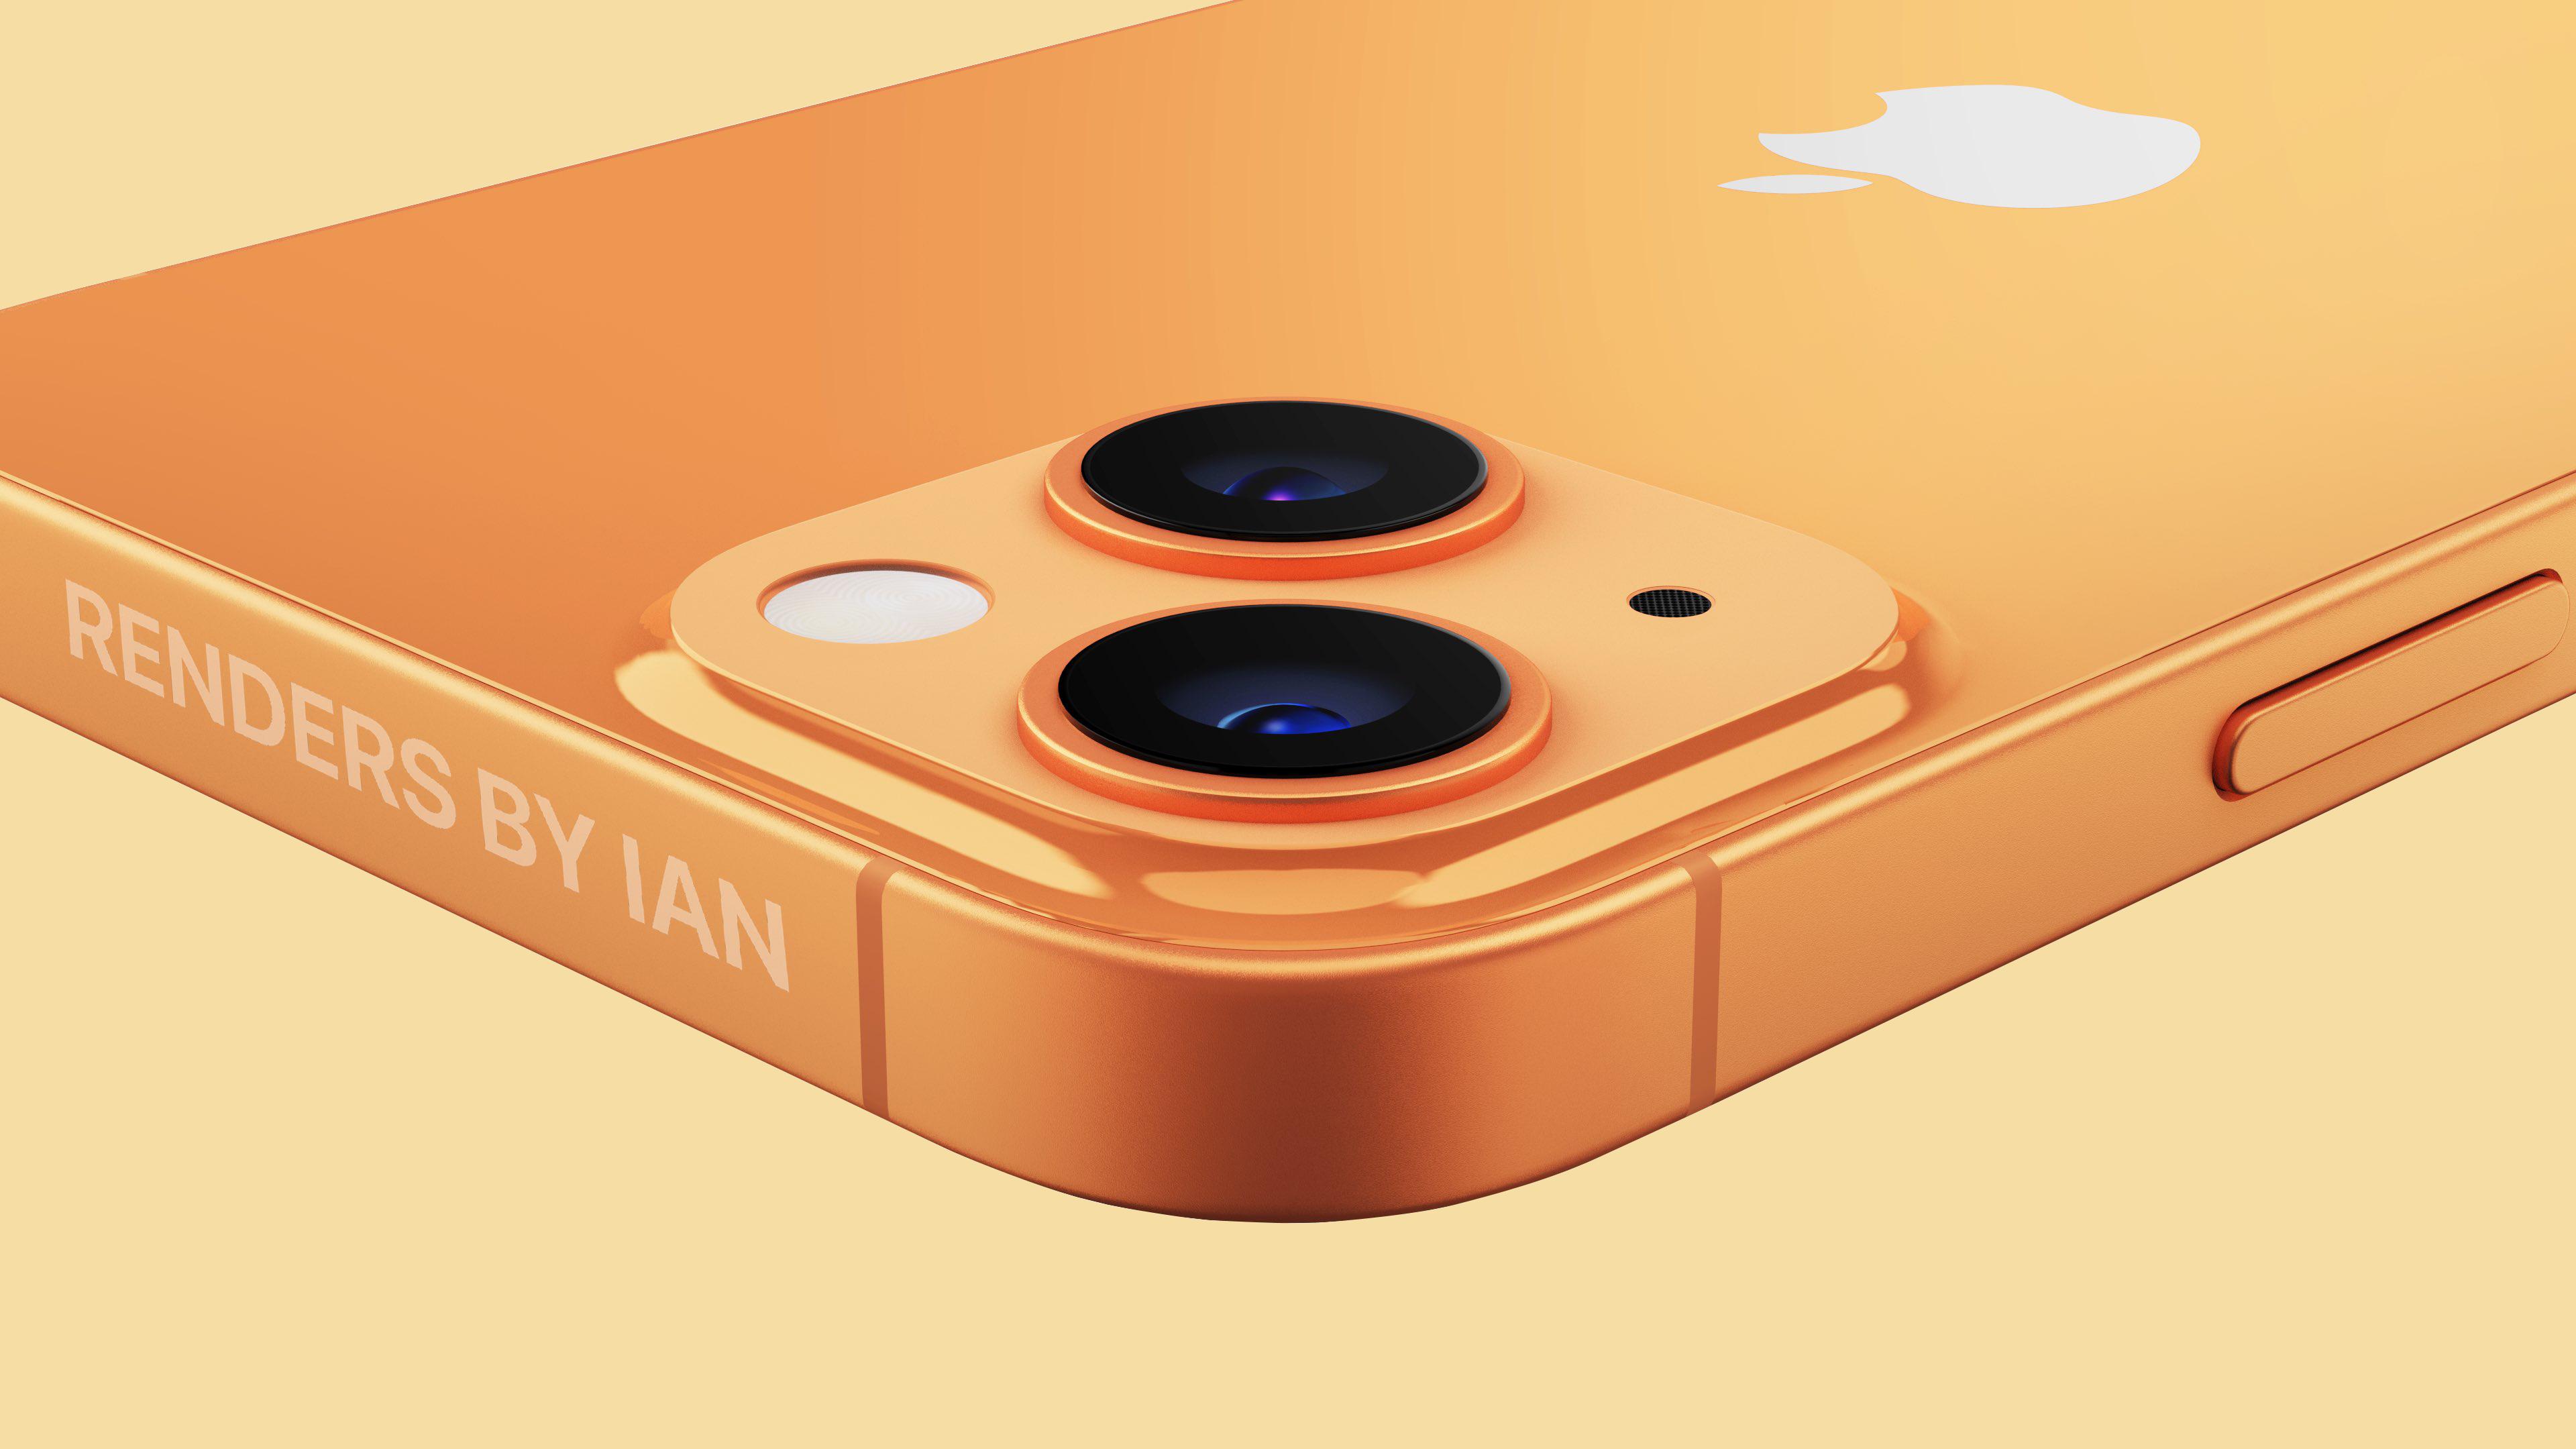 iPhone 13 renders by Ian Zelbo